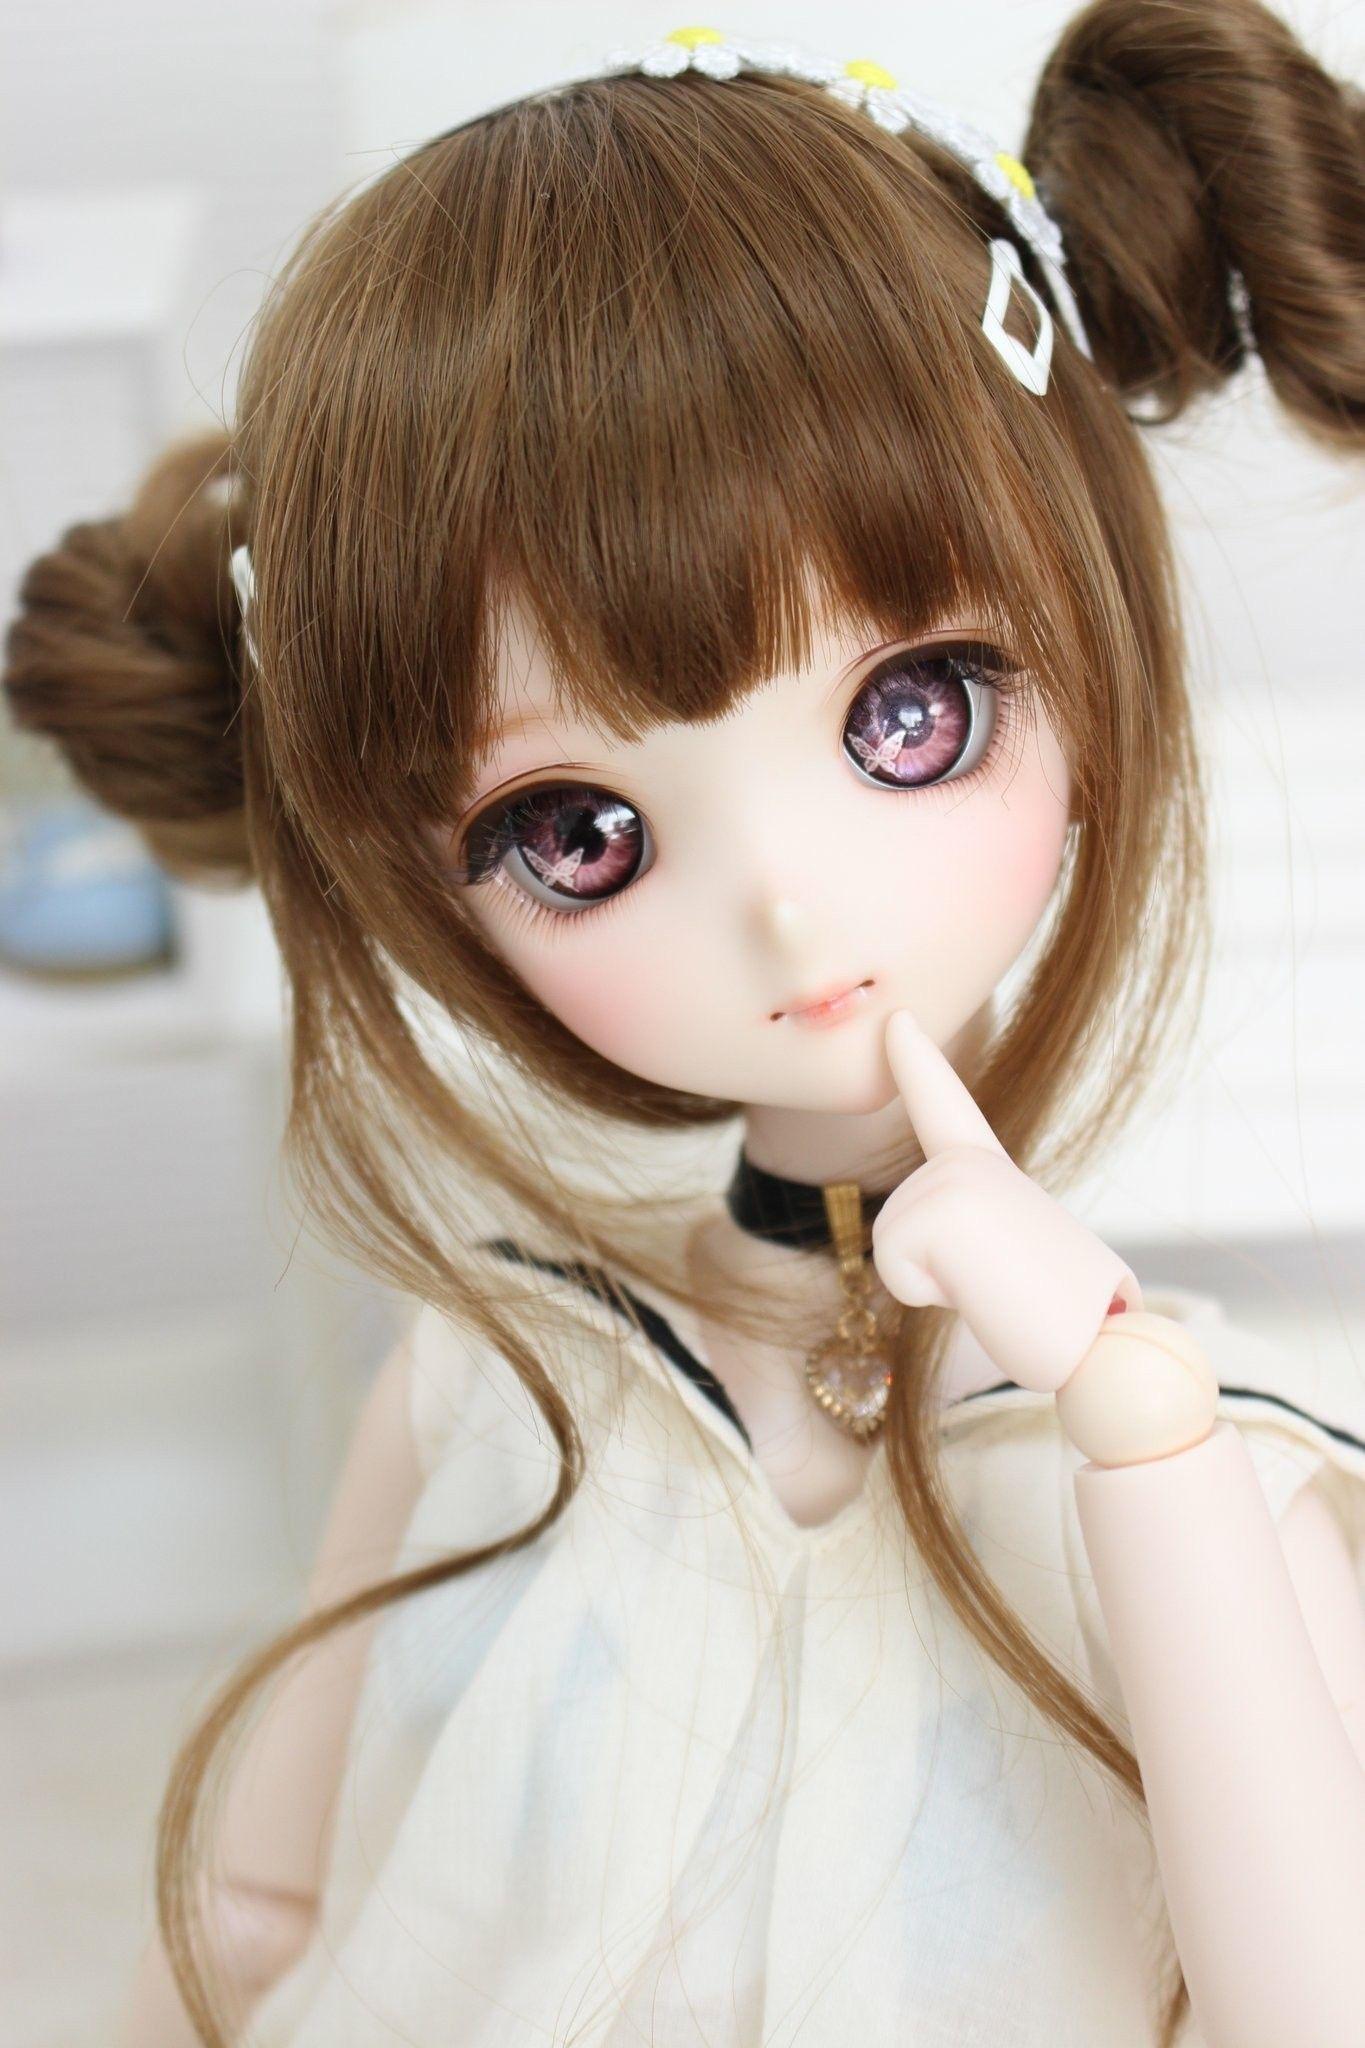 Anime doll kawaii smart doll dollfie bjd anime